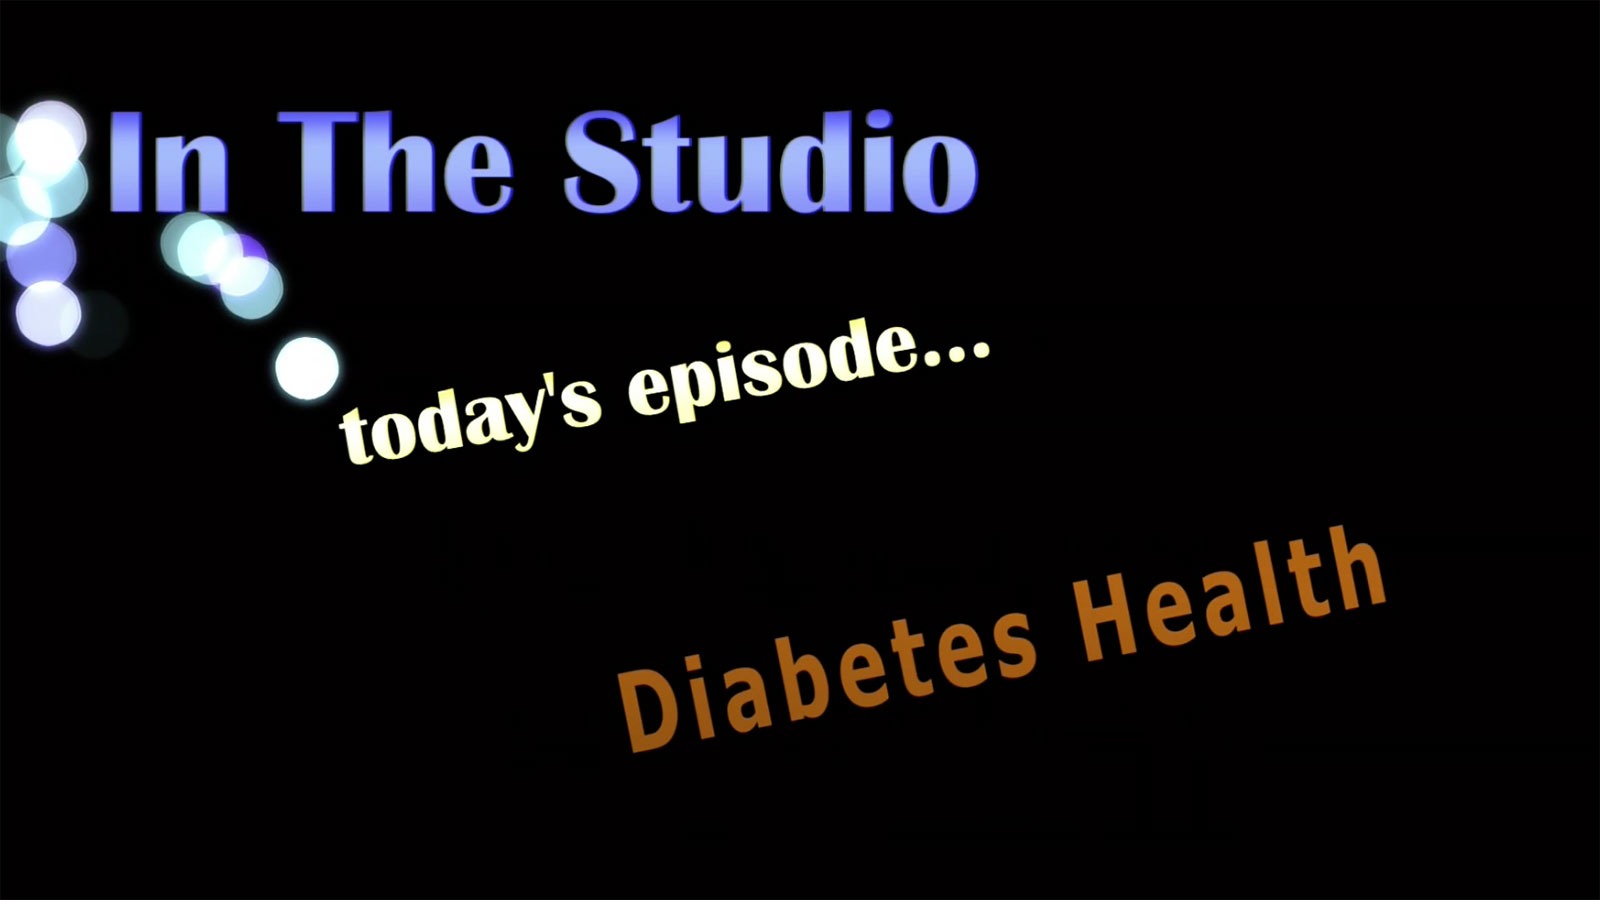 In the Studio: Diabetes Health